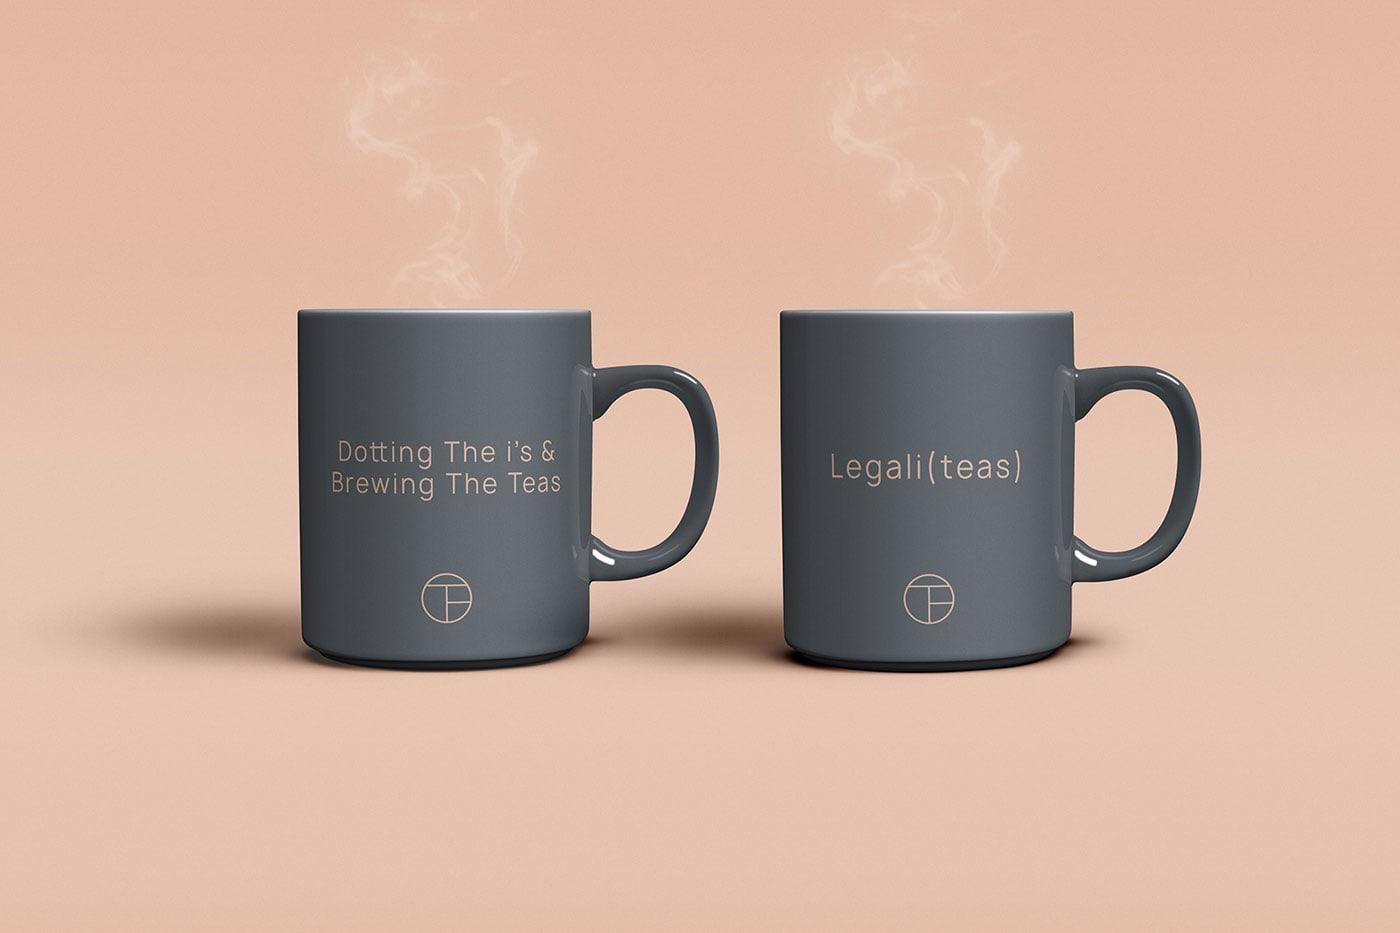 Tolhurst Fisher律師事務所品牌形象設計